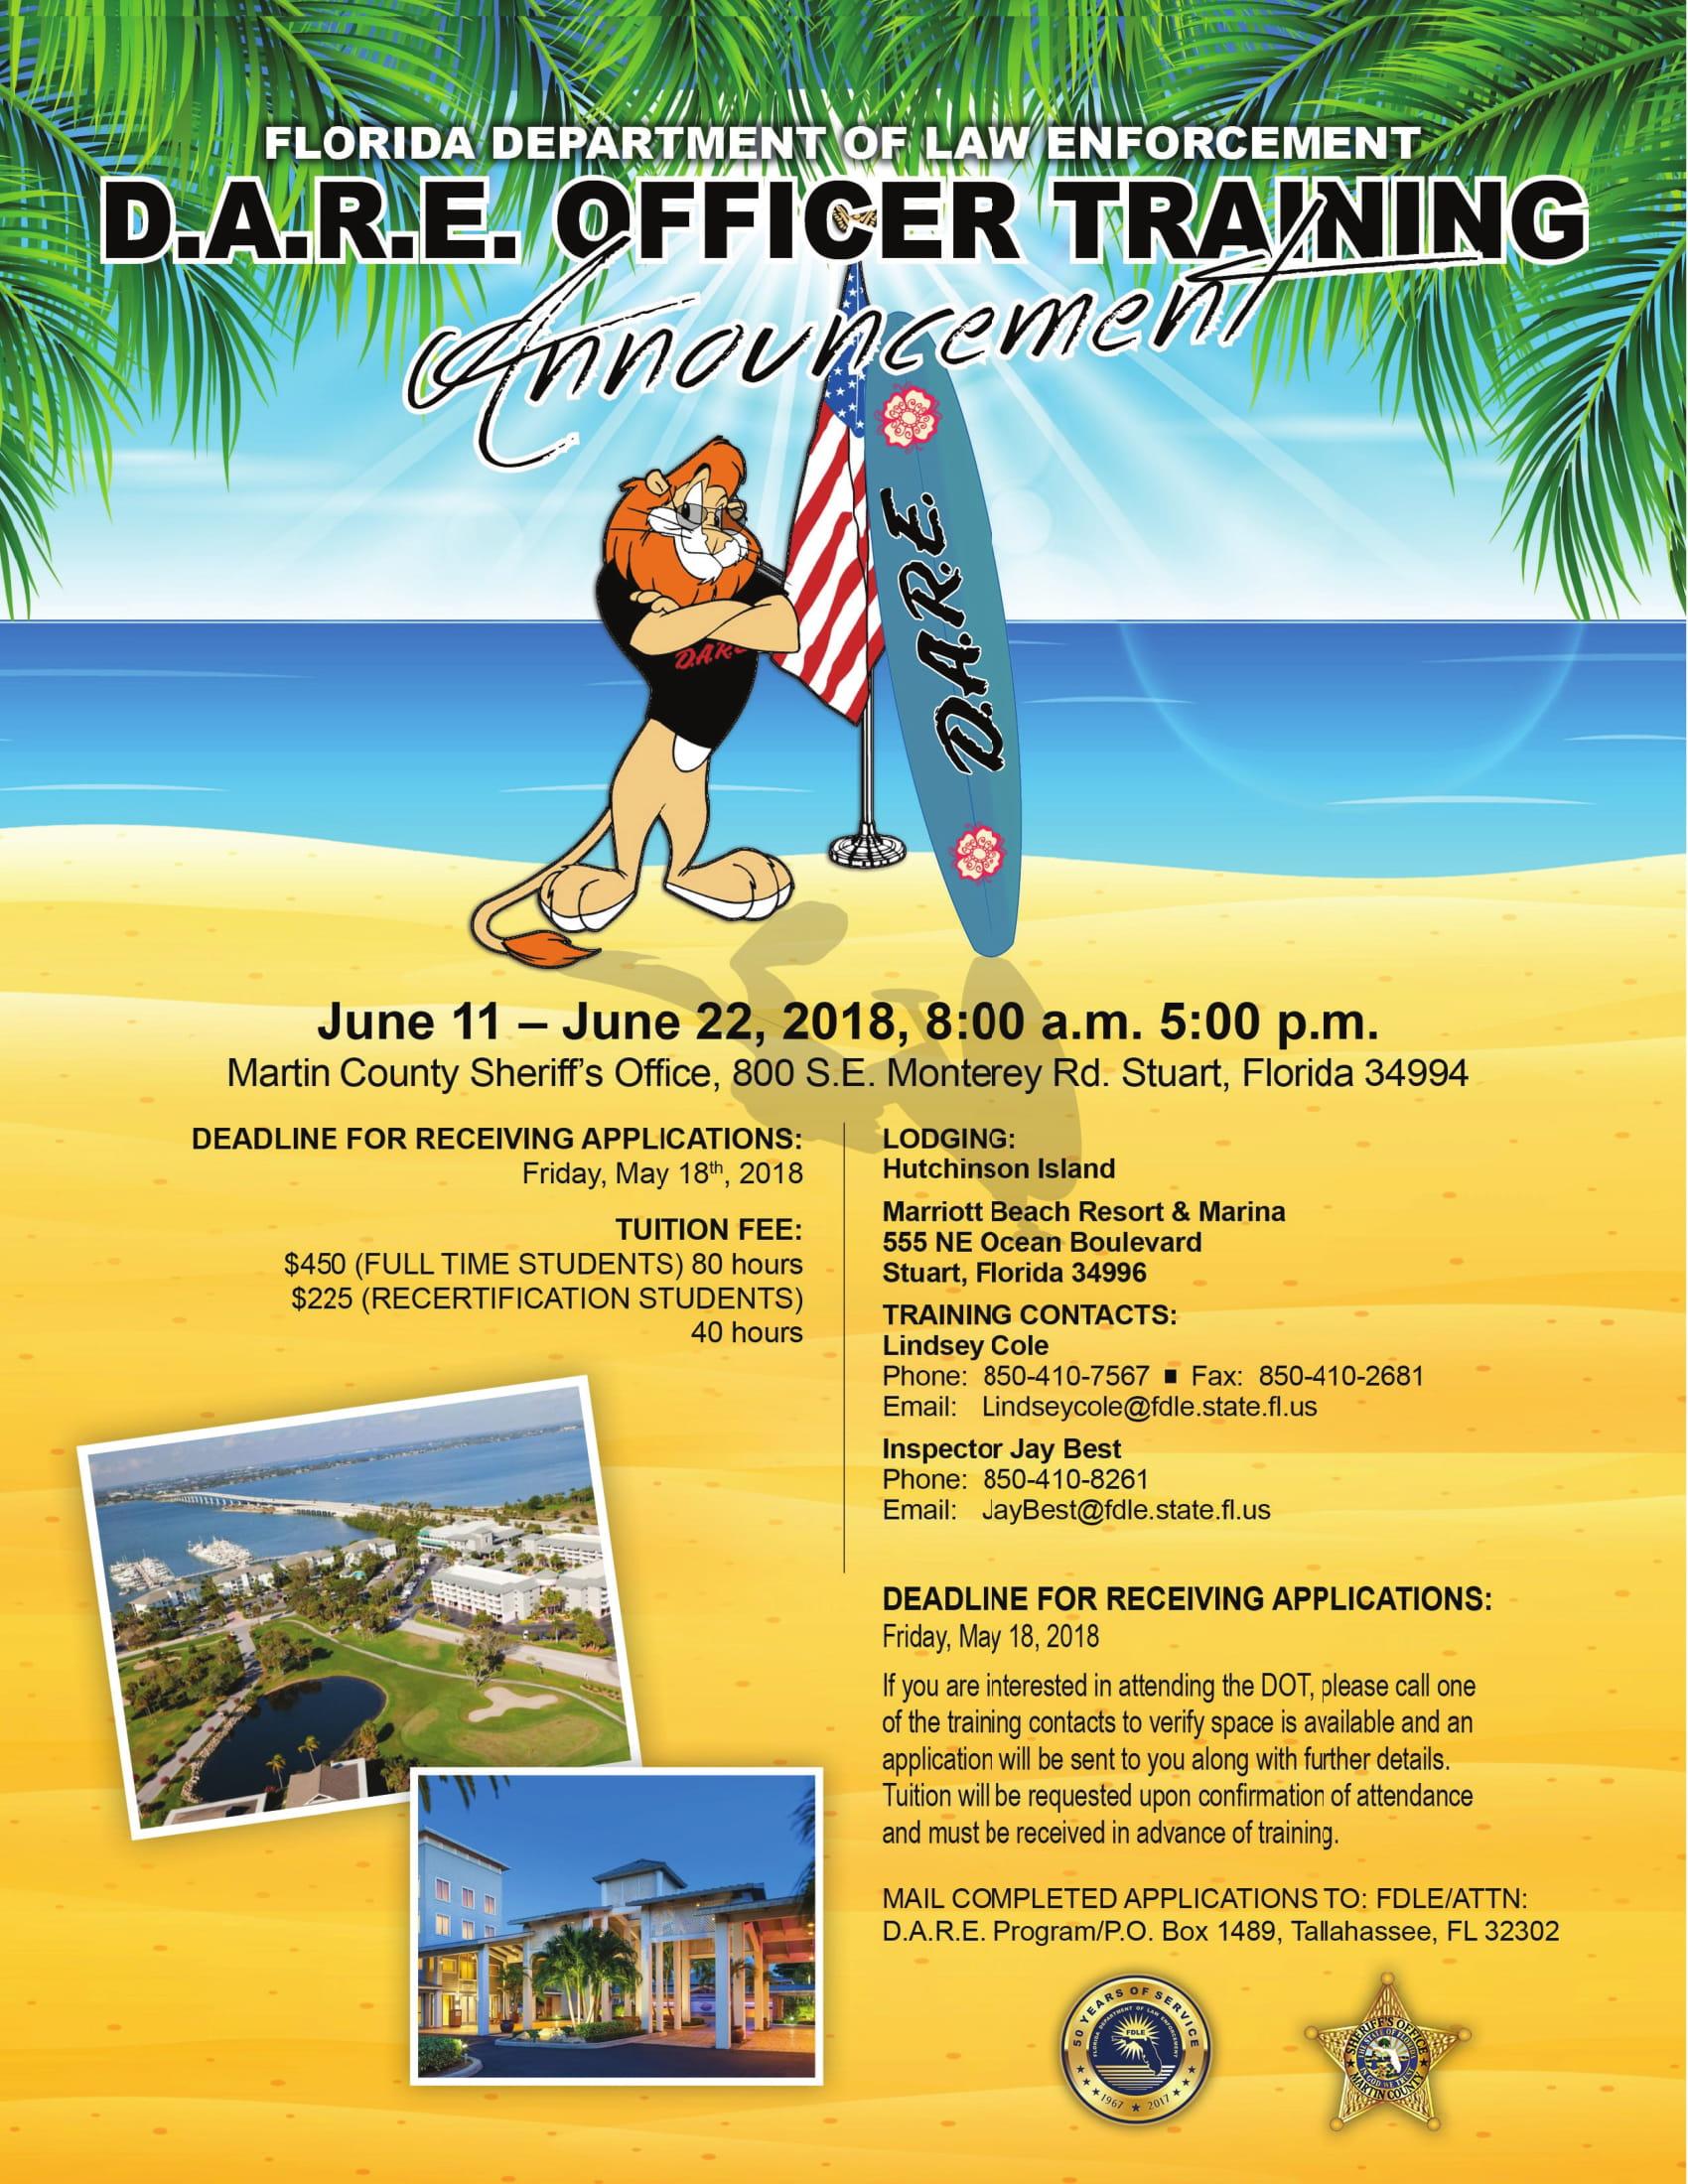 Florida D.A.R.E. Officer Training - Summer 2018 @ Martin County Sheriff's Office | Stuart | Florida | United States